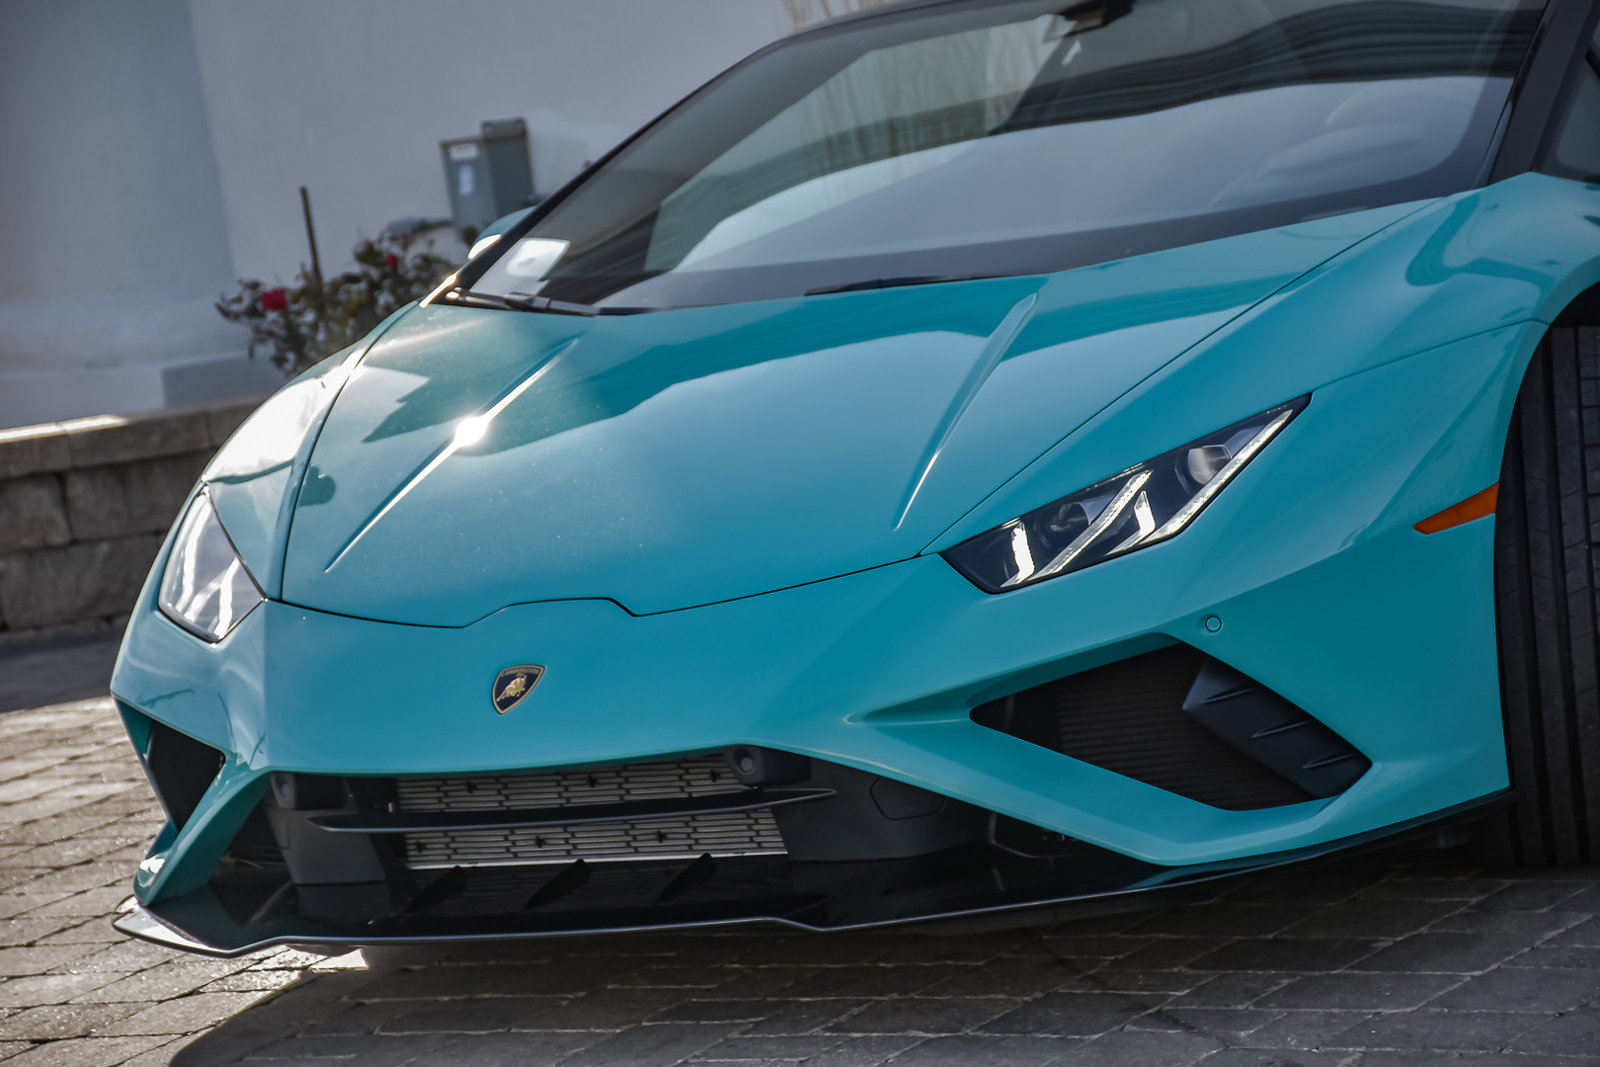 New 2021 Lamborghini Huracan EVO Spyder